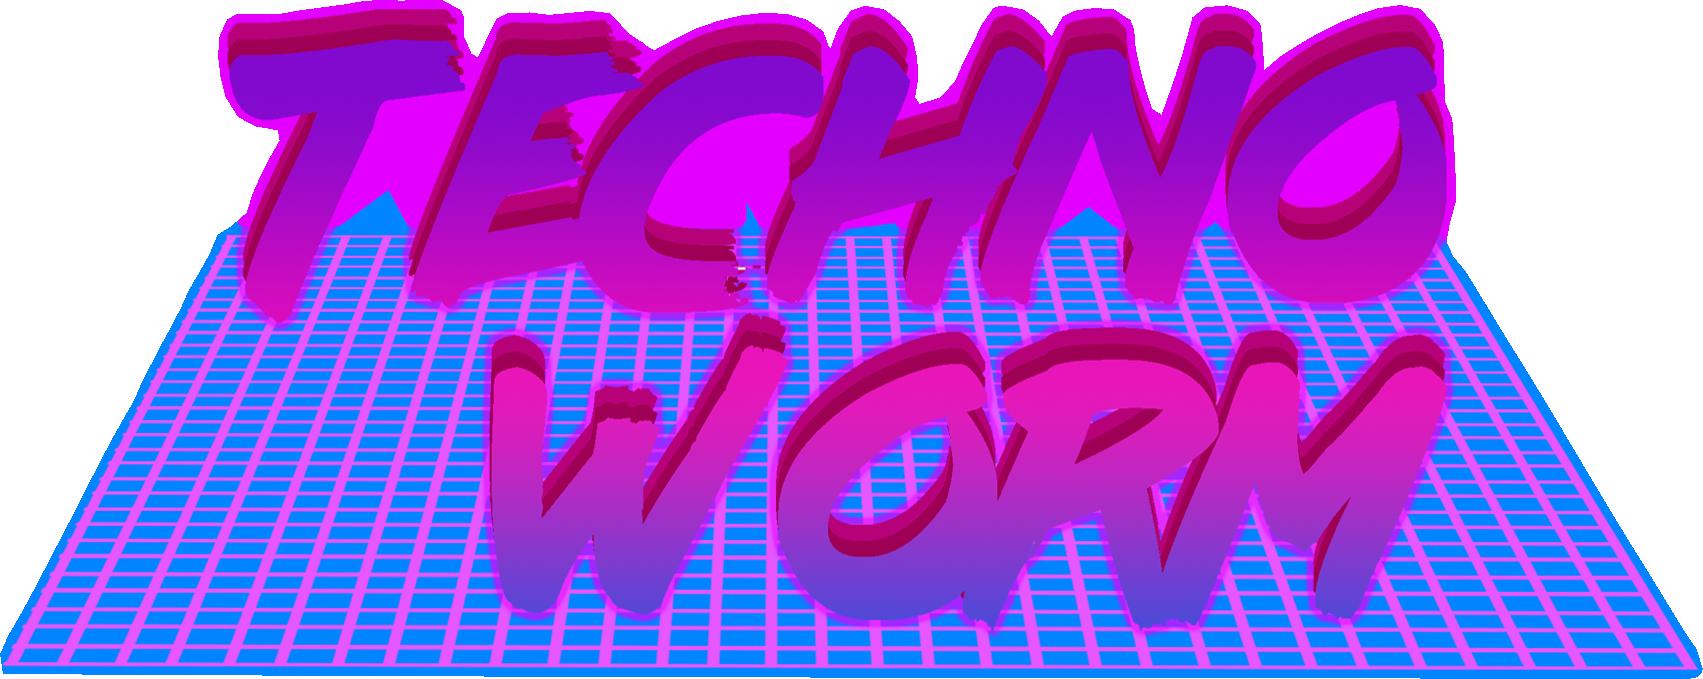 Techno Worm